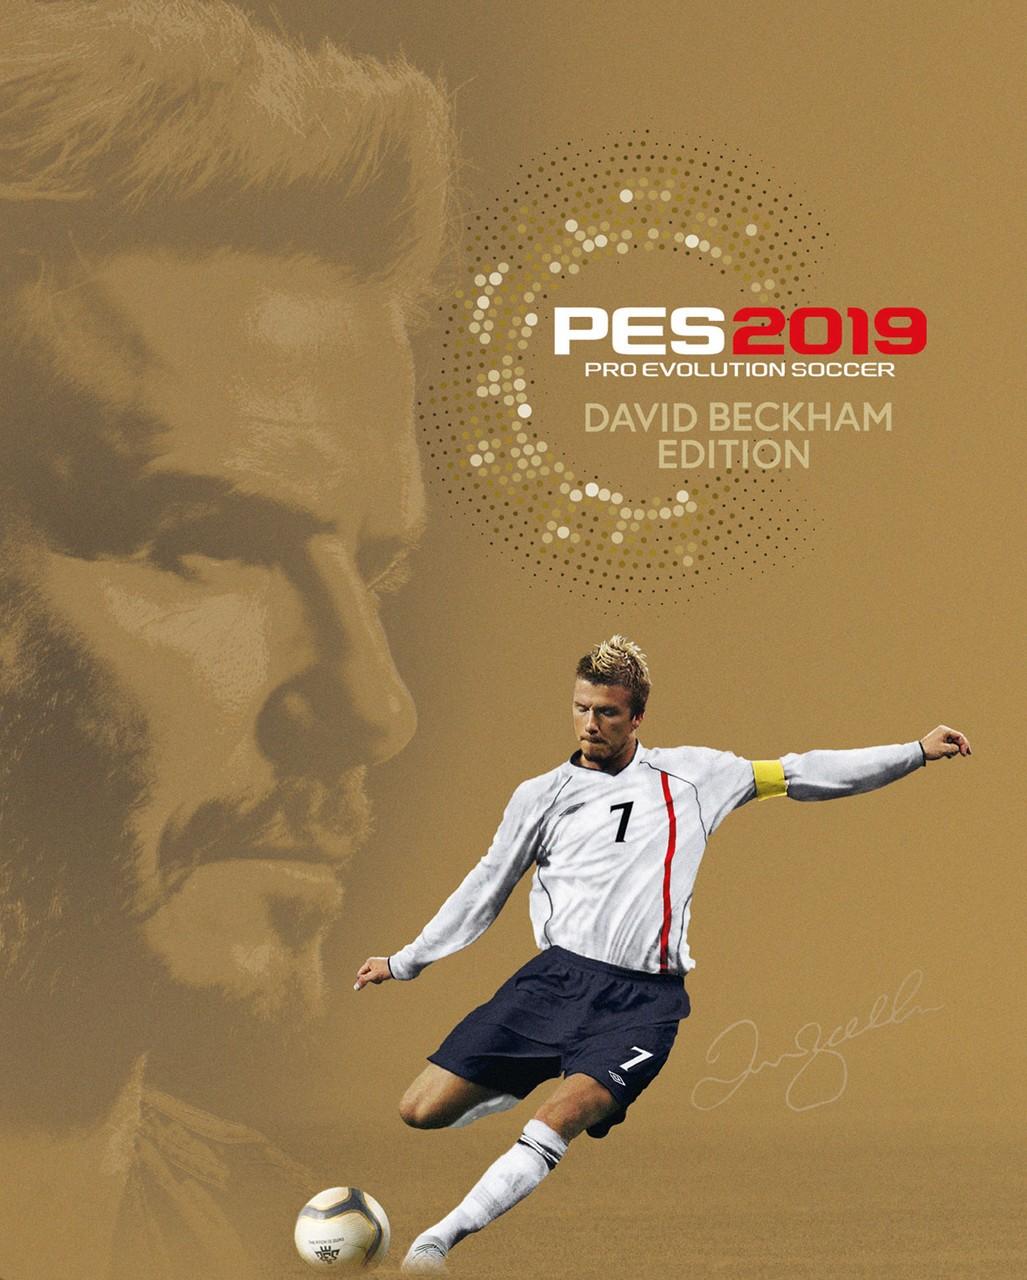 Pro Evolution Soccer 2019 BECKHAM EDITION PS4